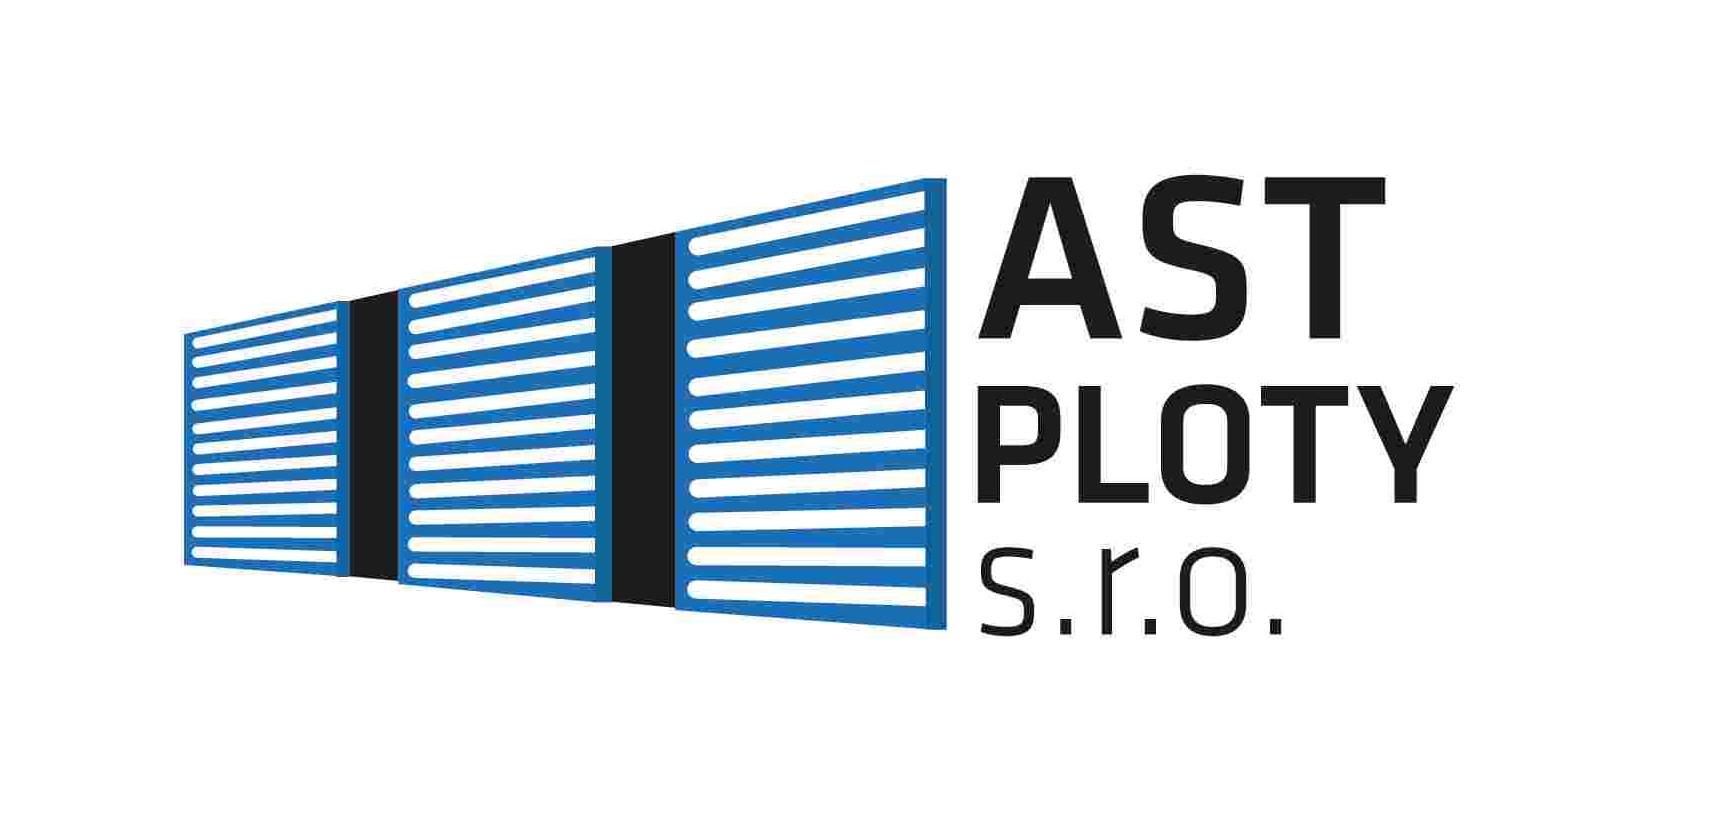 AST ploty